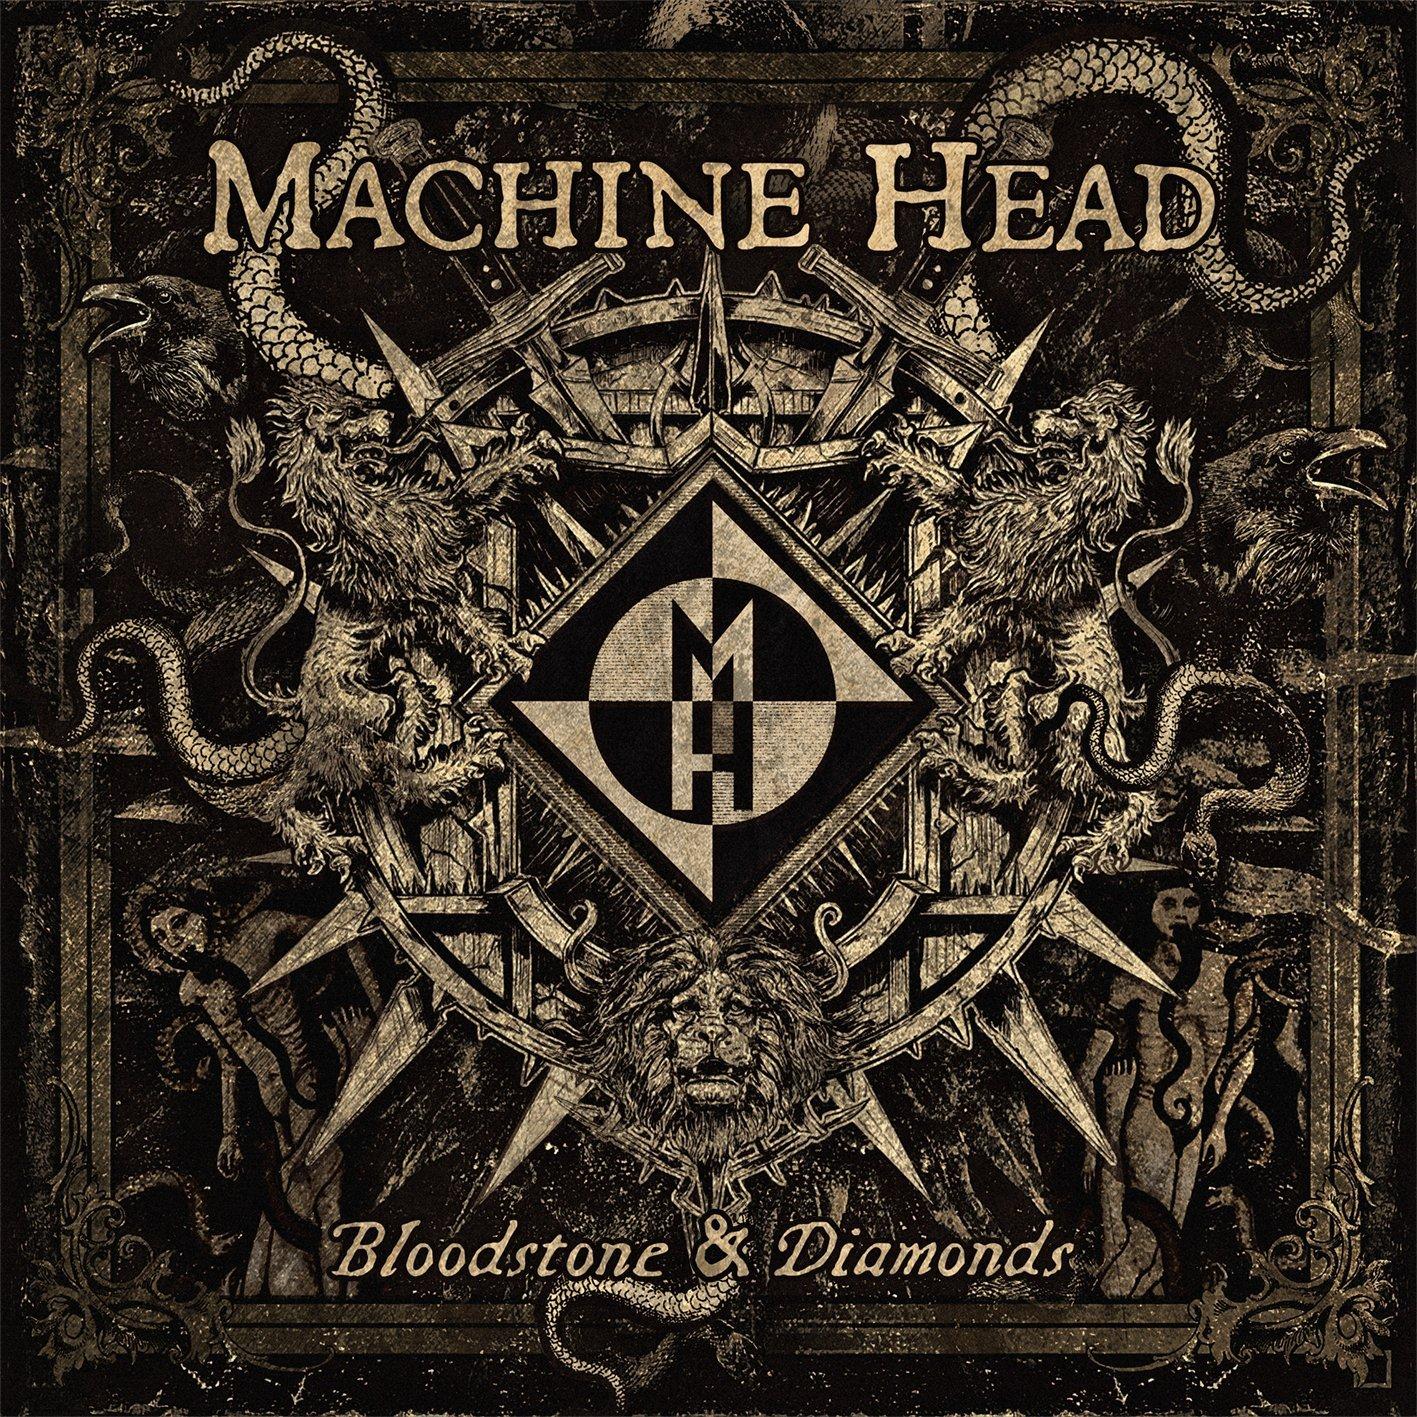 07. Machine Head BLOODSTONE & DIAMONDS 5,00